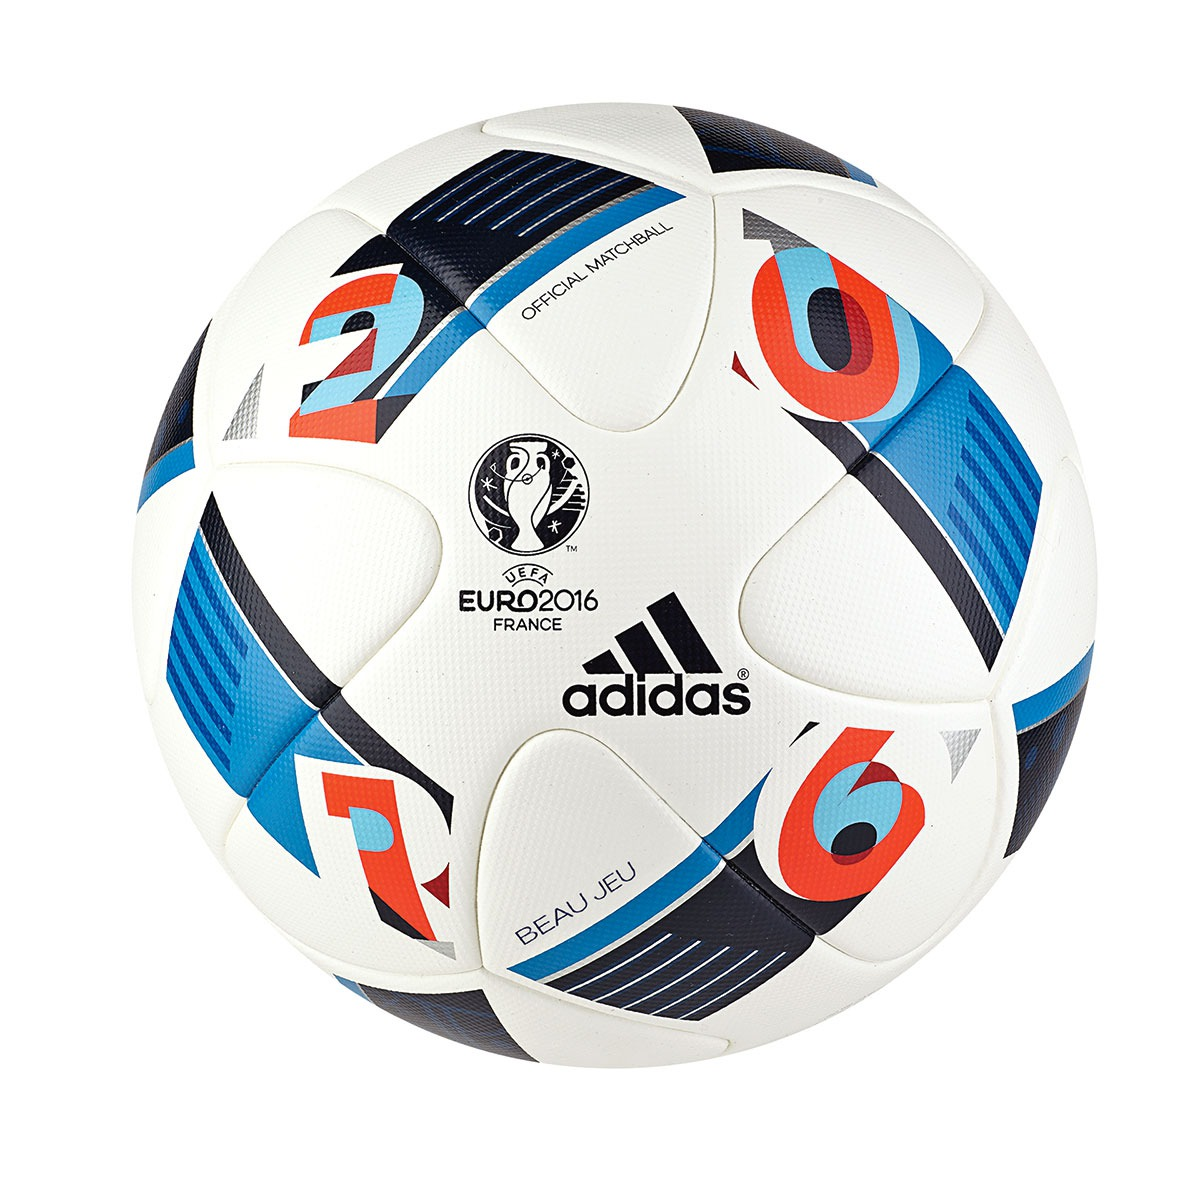 1200x1200 Soccer Balls